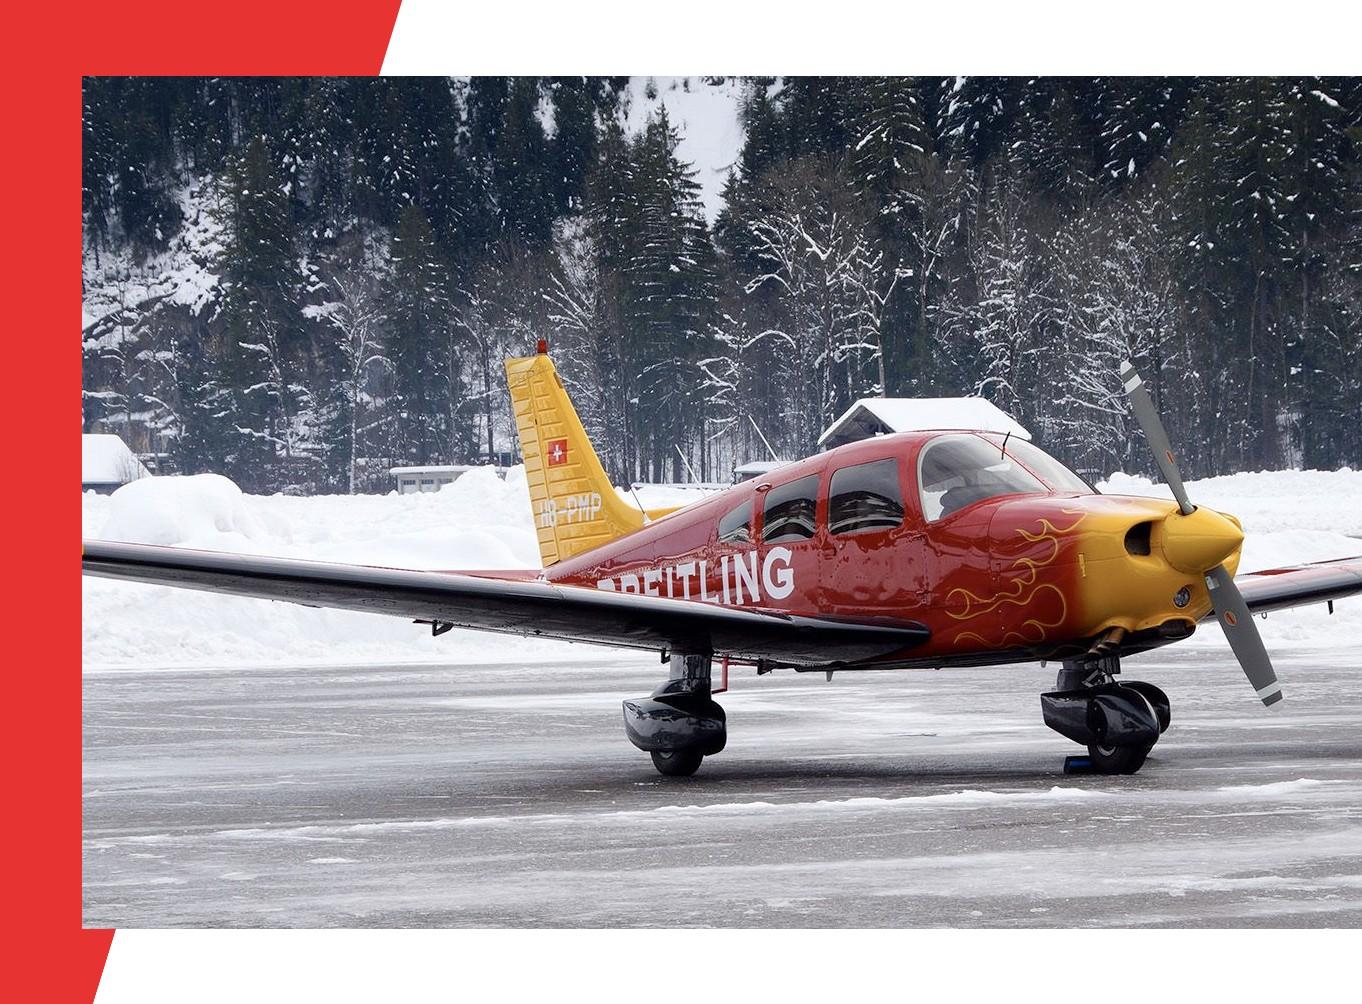 https://www.lausanne-aeroclub.ch/wp-content/uploads/2019/10/plane_Dakota.jpg